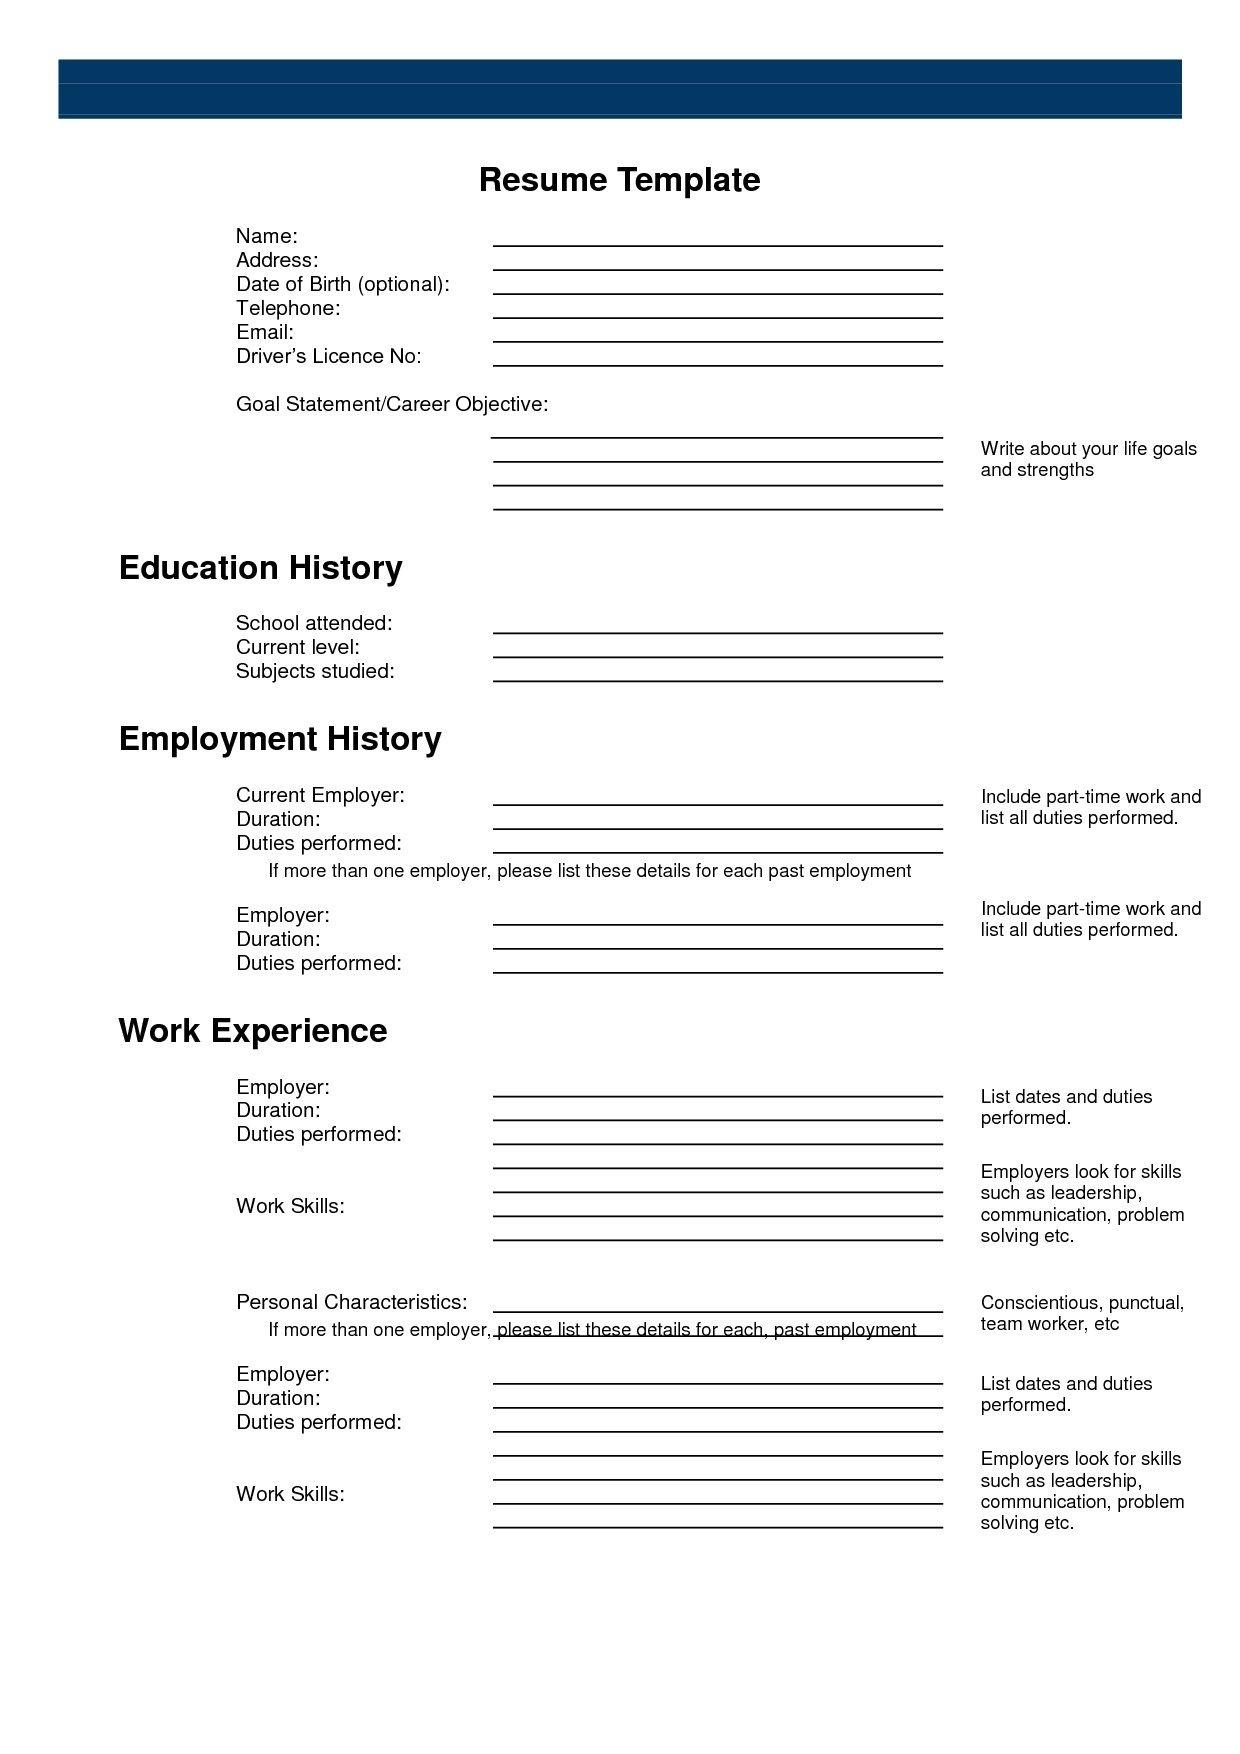 Printable | Work | Free Printable Resume, Free Printable Resume - Free Printable Resume Builder